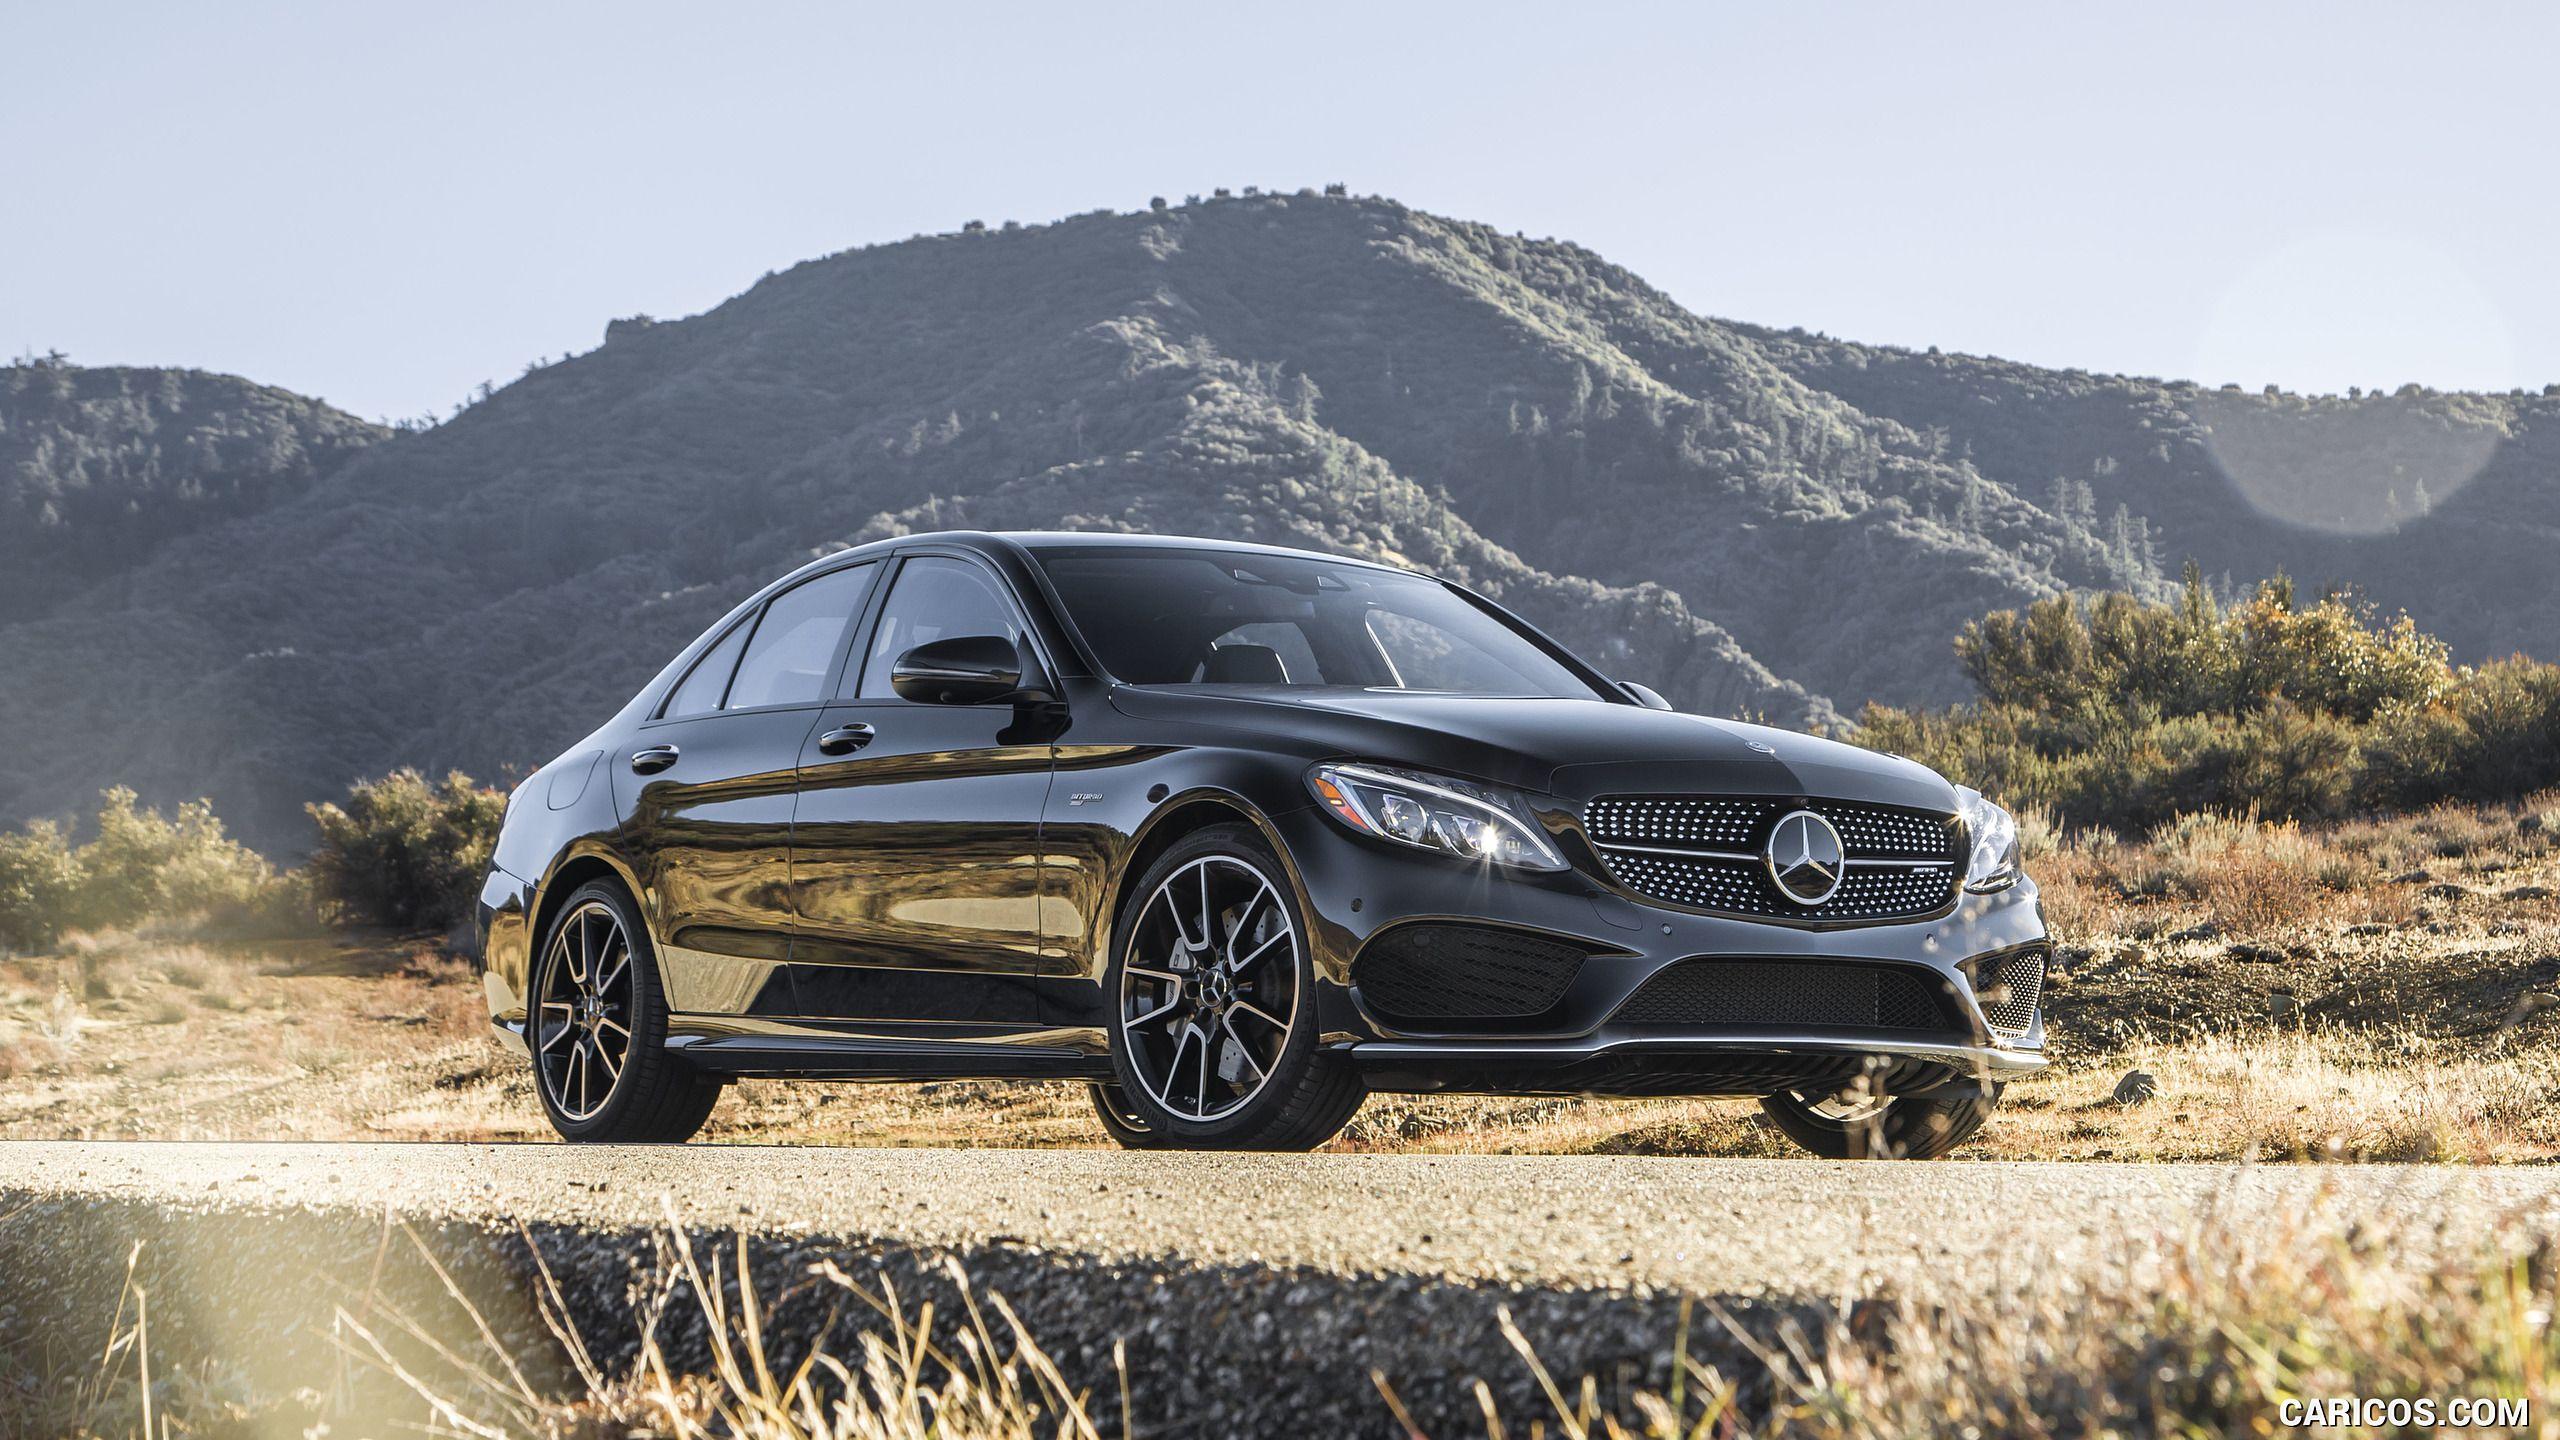 2017 Mercedes Amg C43 Sedan Us Spec Wallpaper Mercedes Amg Mercedes W124 Mercedes